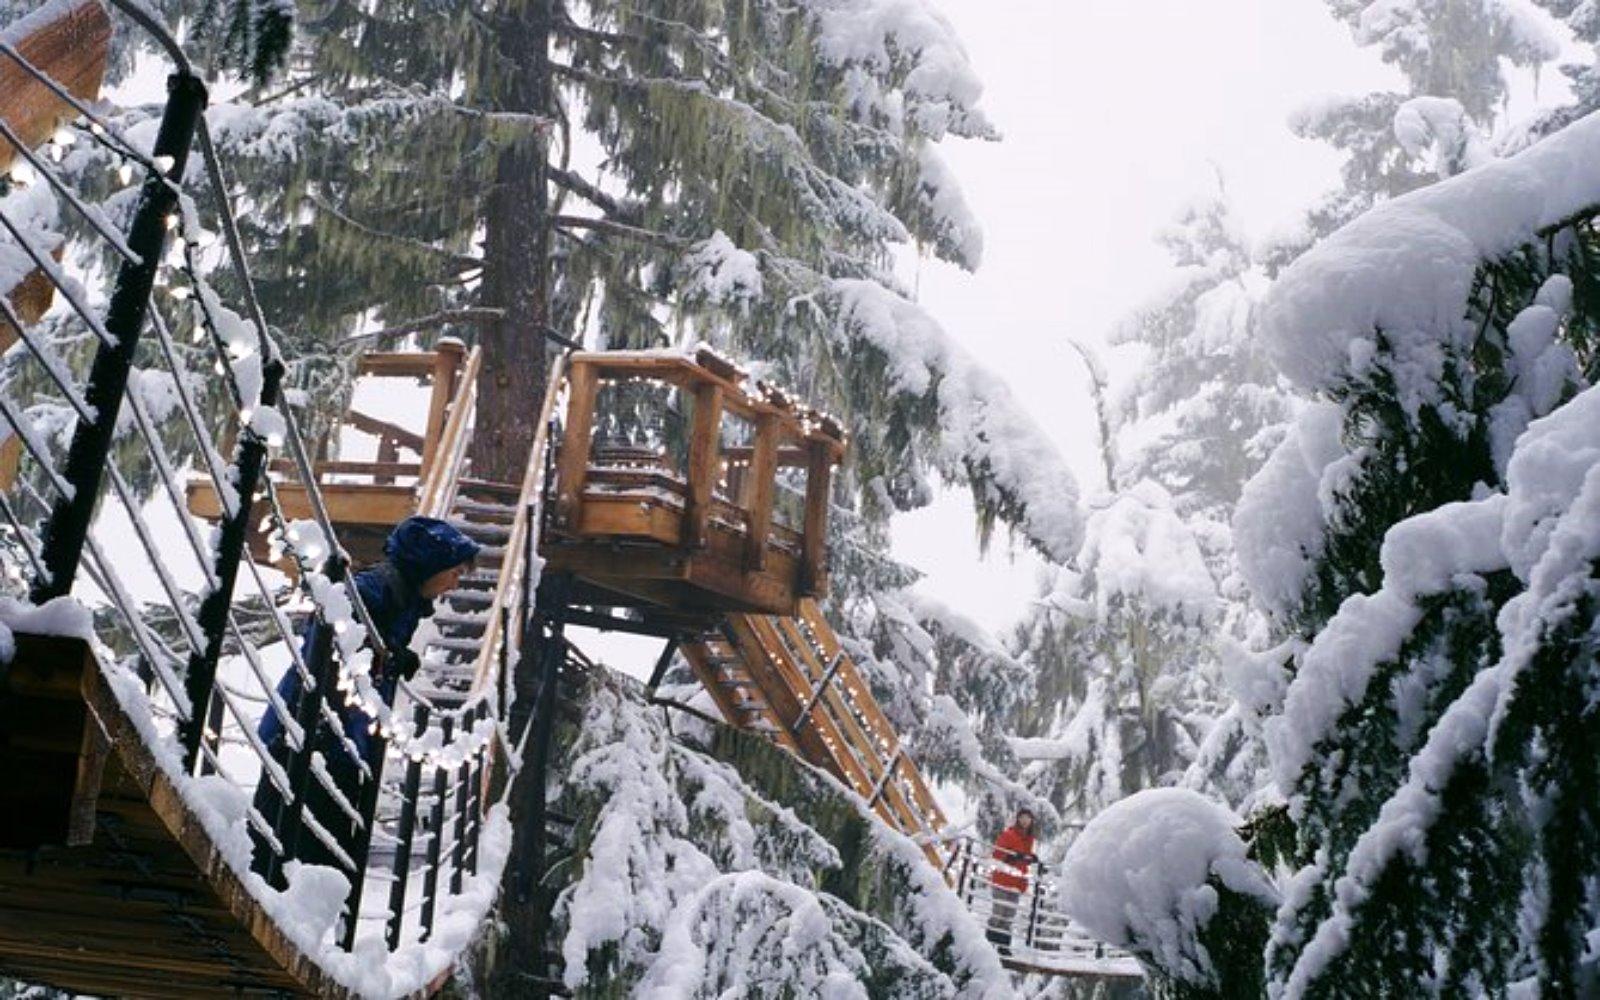 A man enjoys the Whistler Canopy Walk Adventure